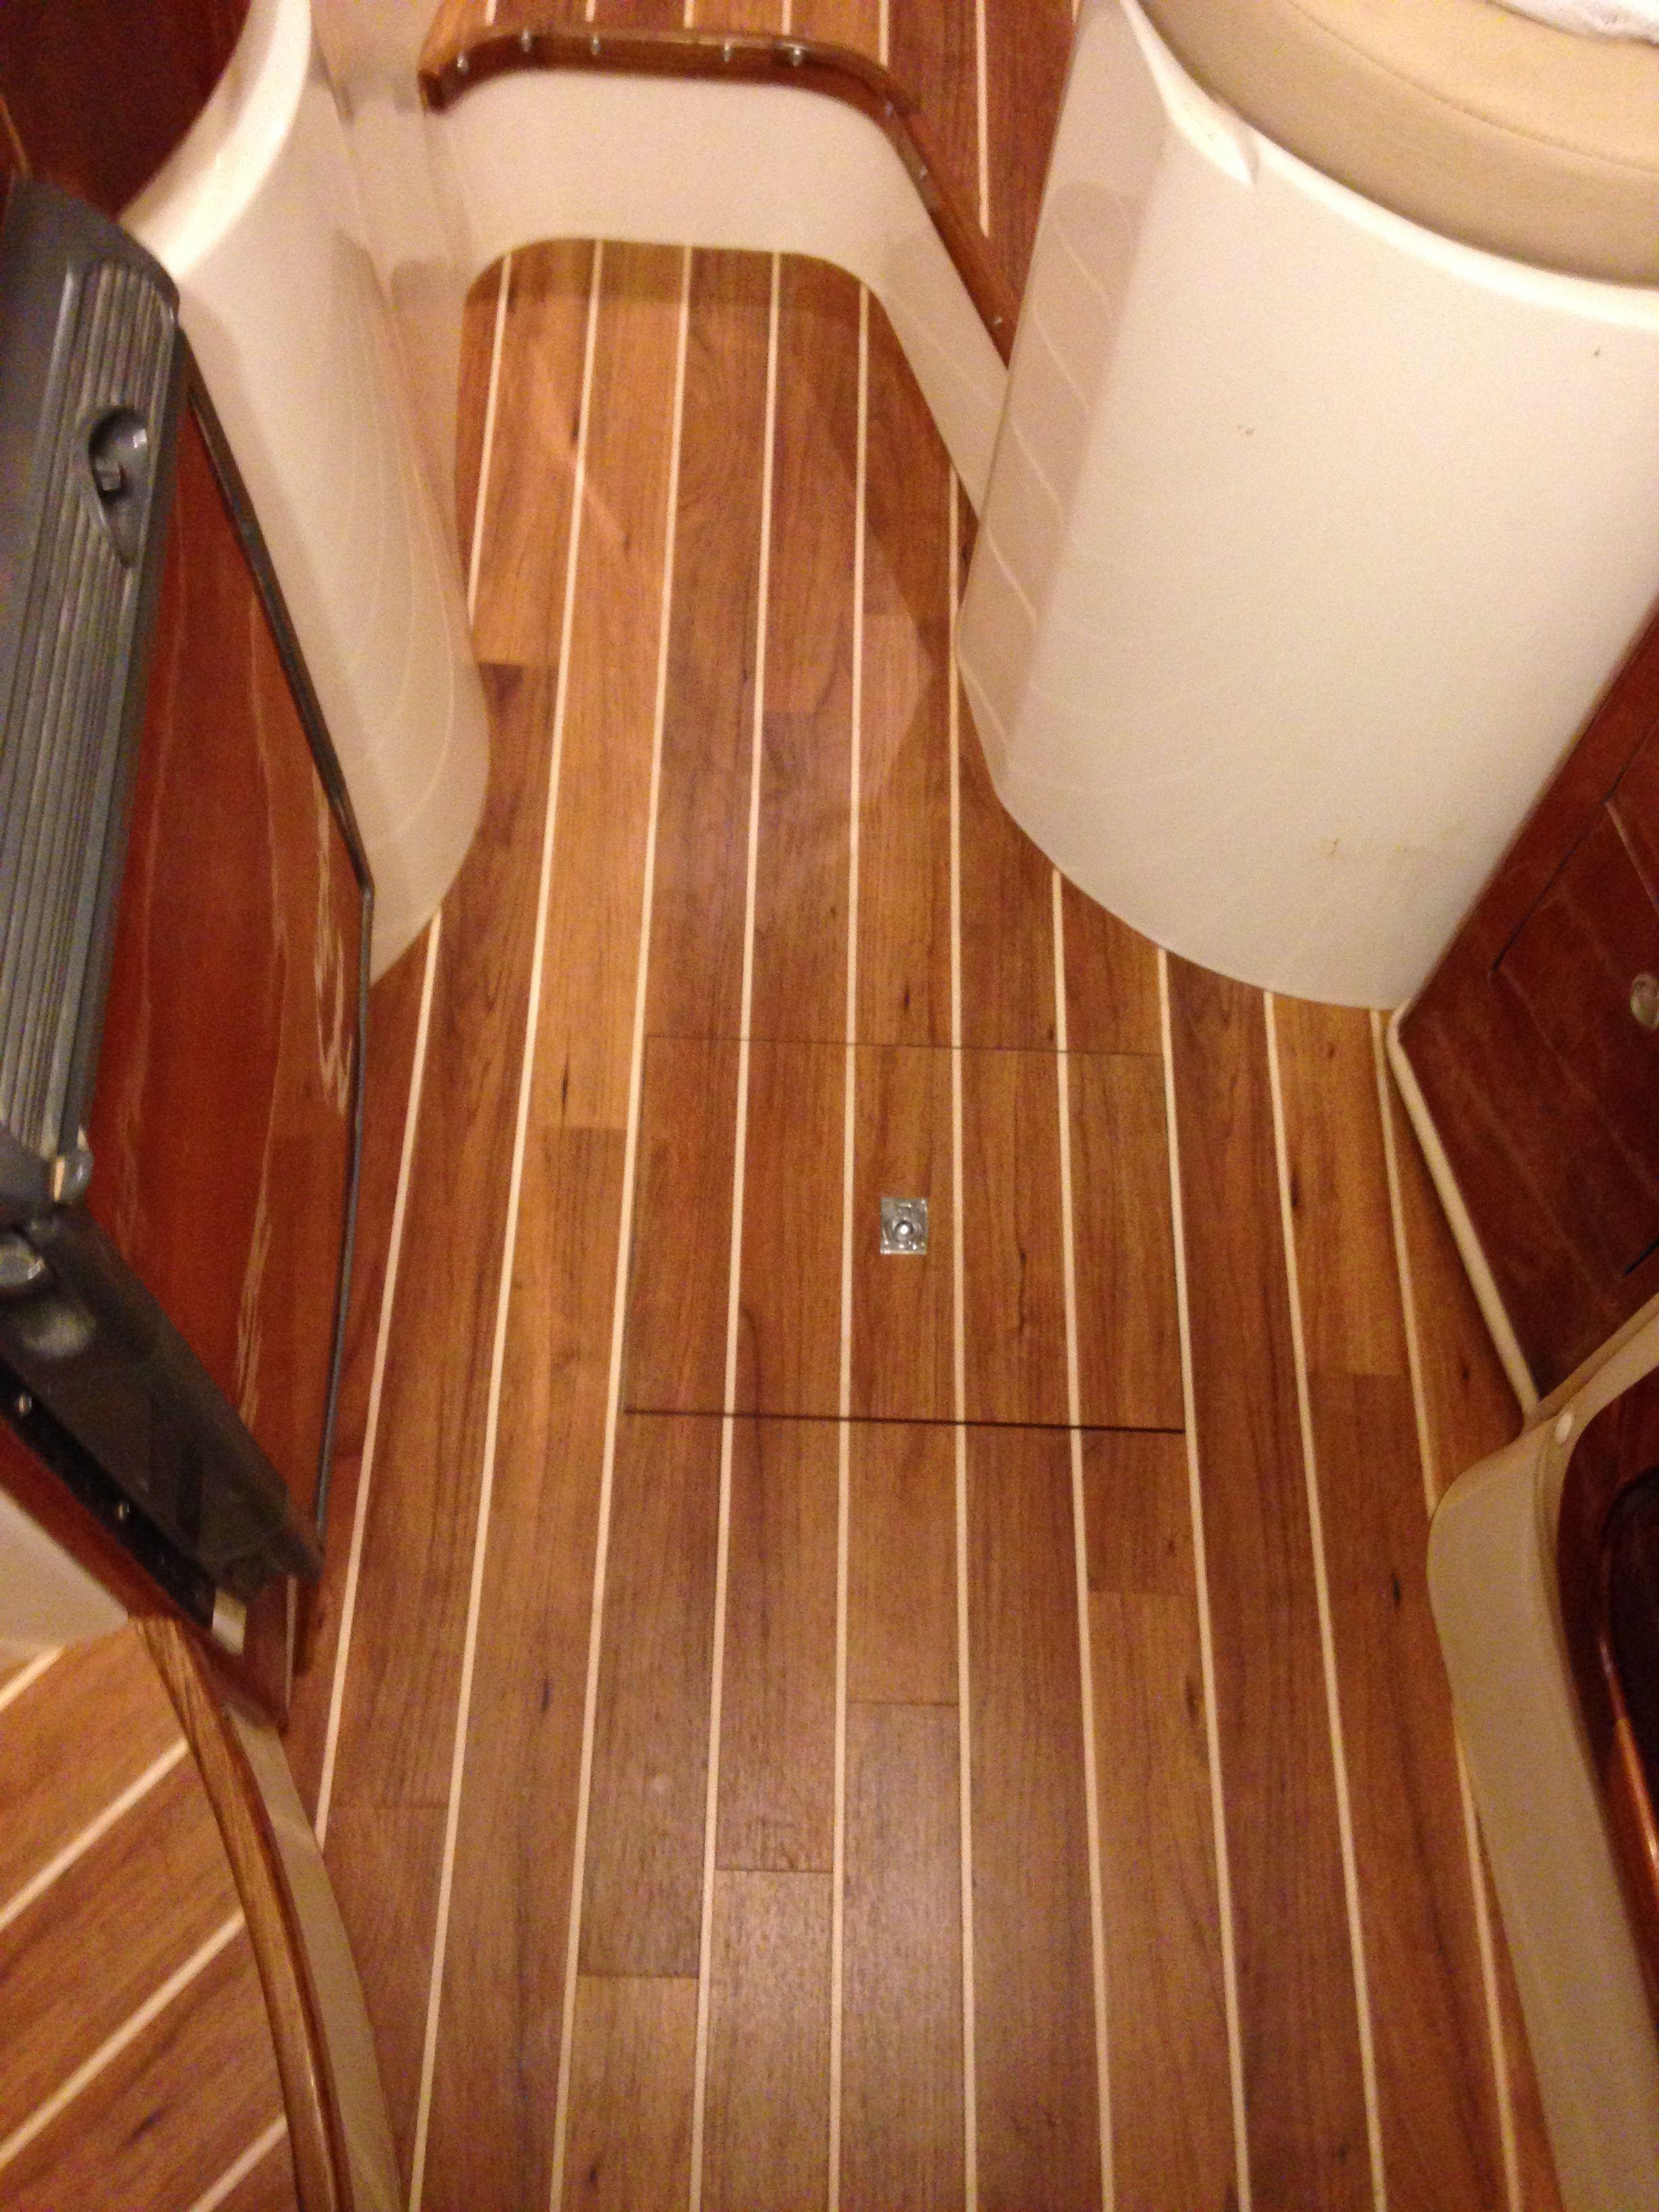 Amtico Interior Flooring Teak Decking Http Www Custommarinecarpentry Com Interior Floor Flooring Boat Interior